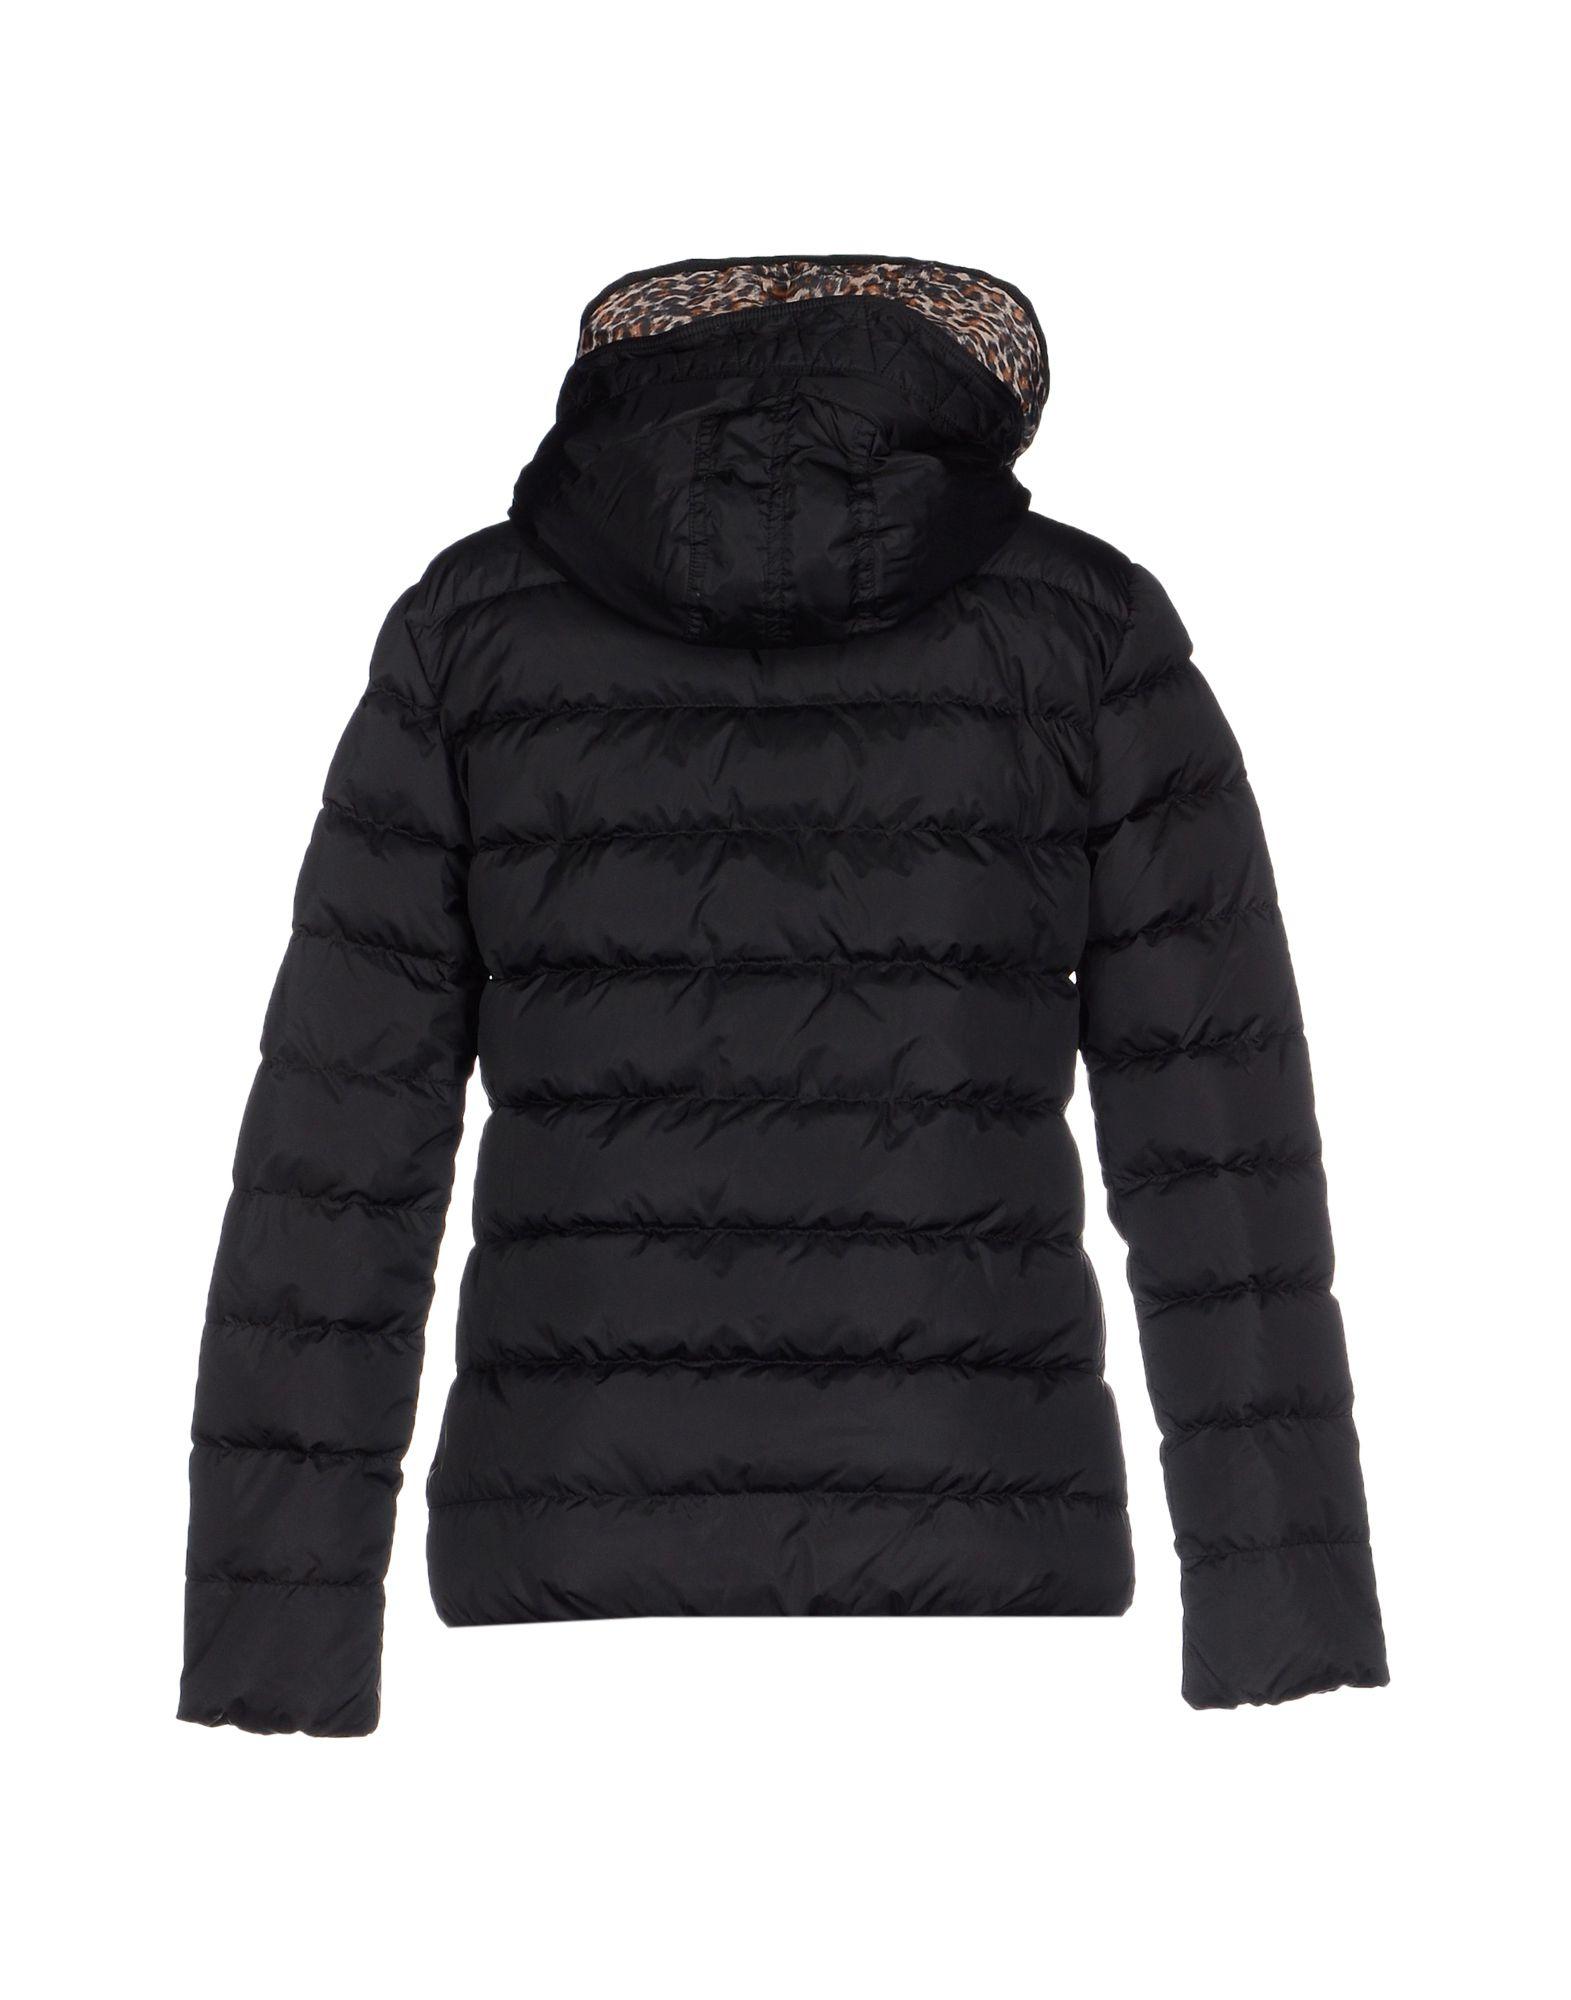 maison scotch down jacket in black lyst. Black Bedroom Furniture Sets. Home Design Ideas